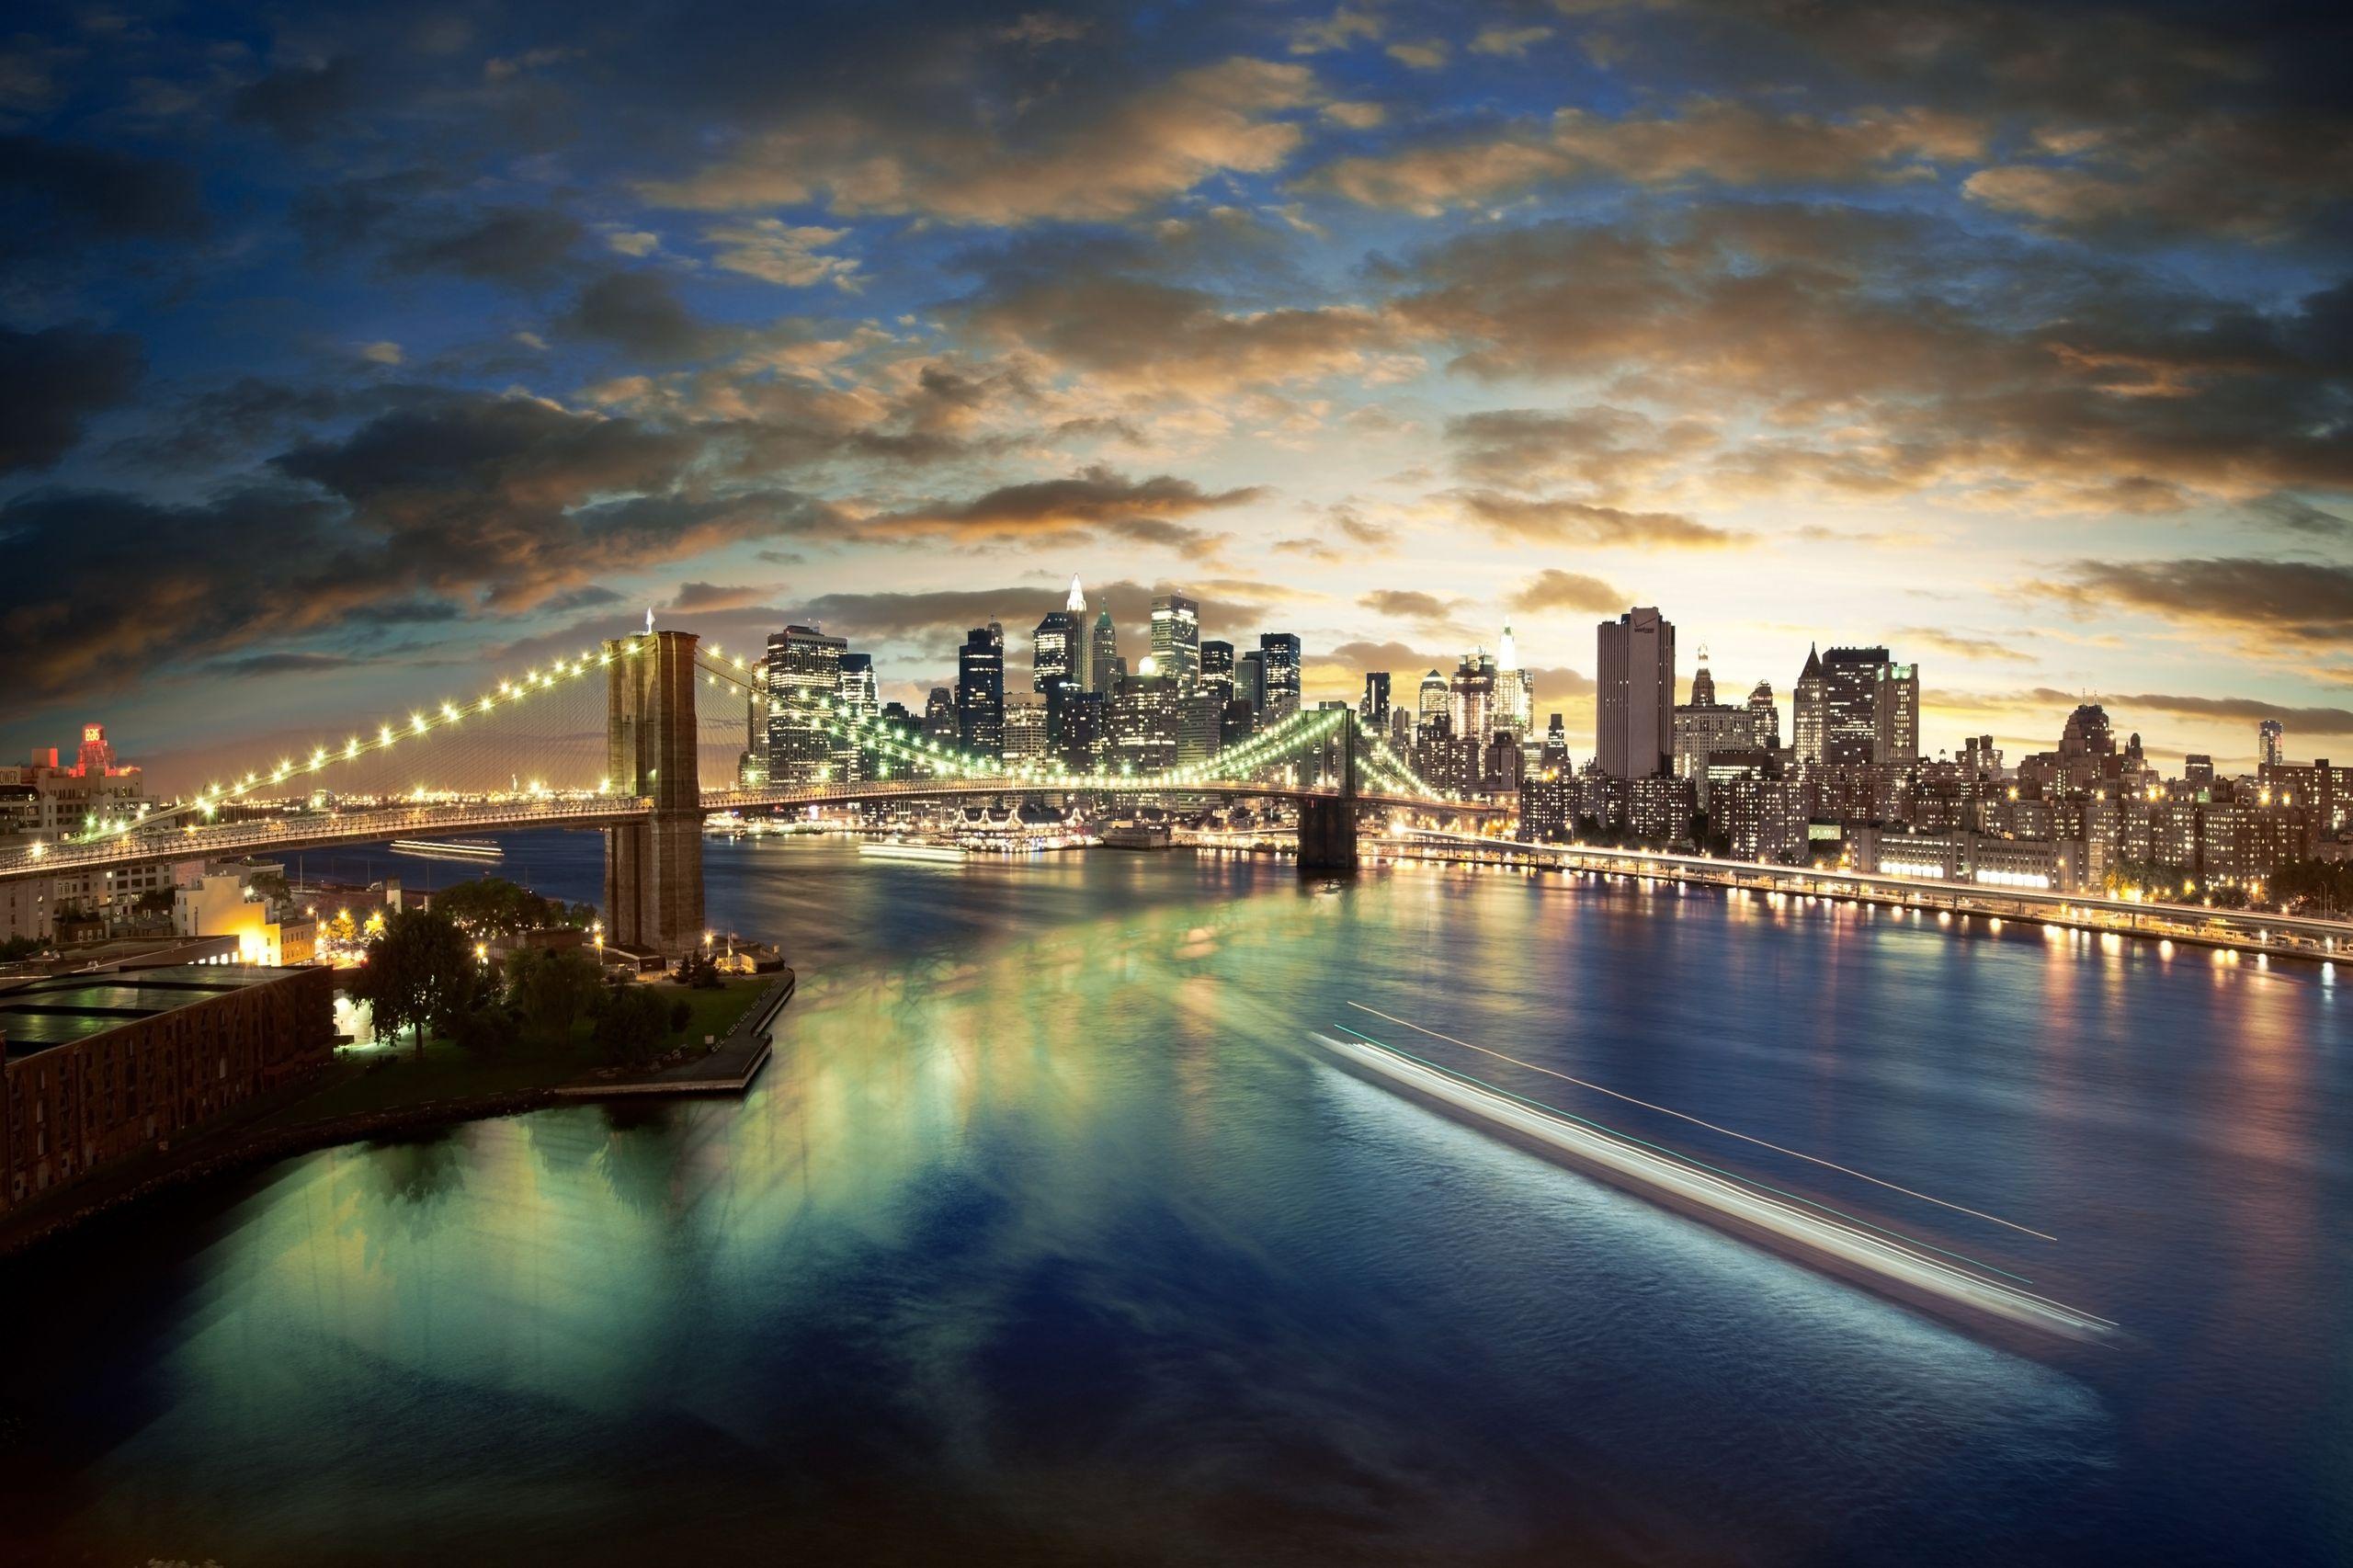 Brooklyn Bridge (New York, USA) / 2560 x 1706 / Locality ...